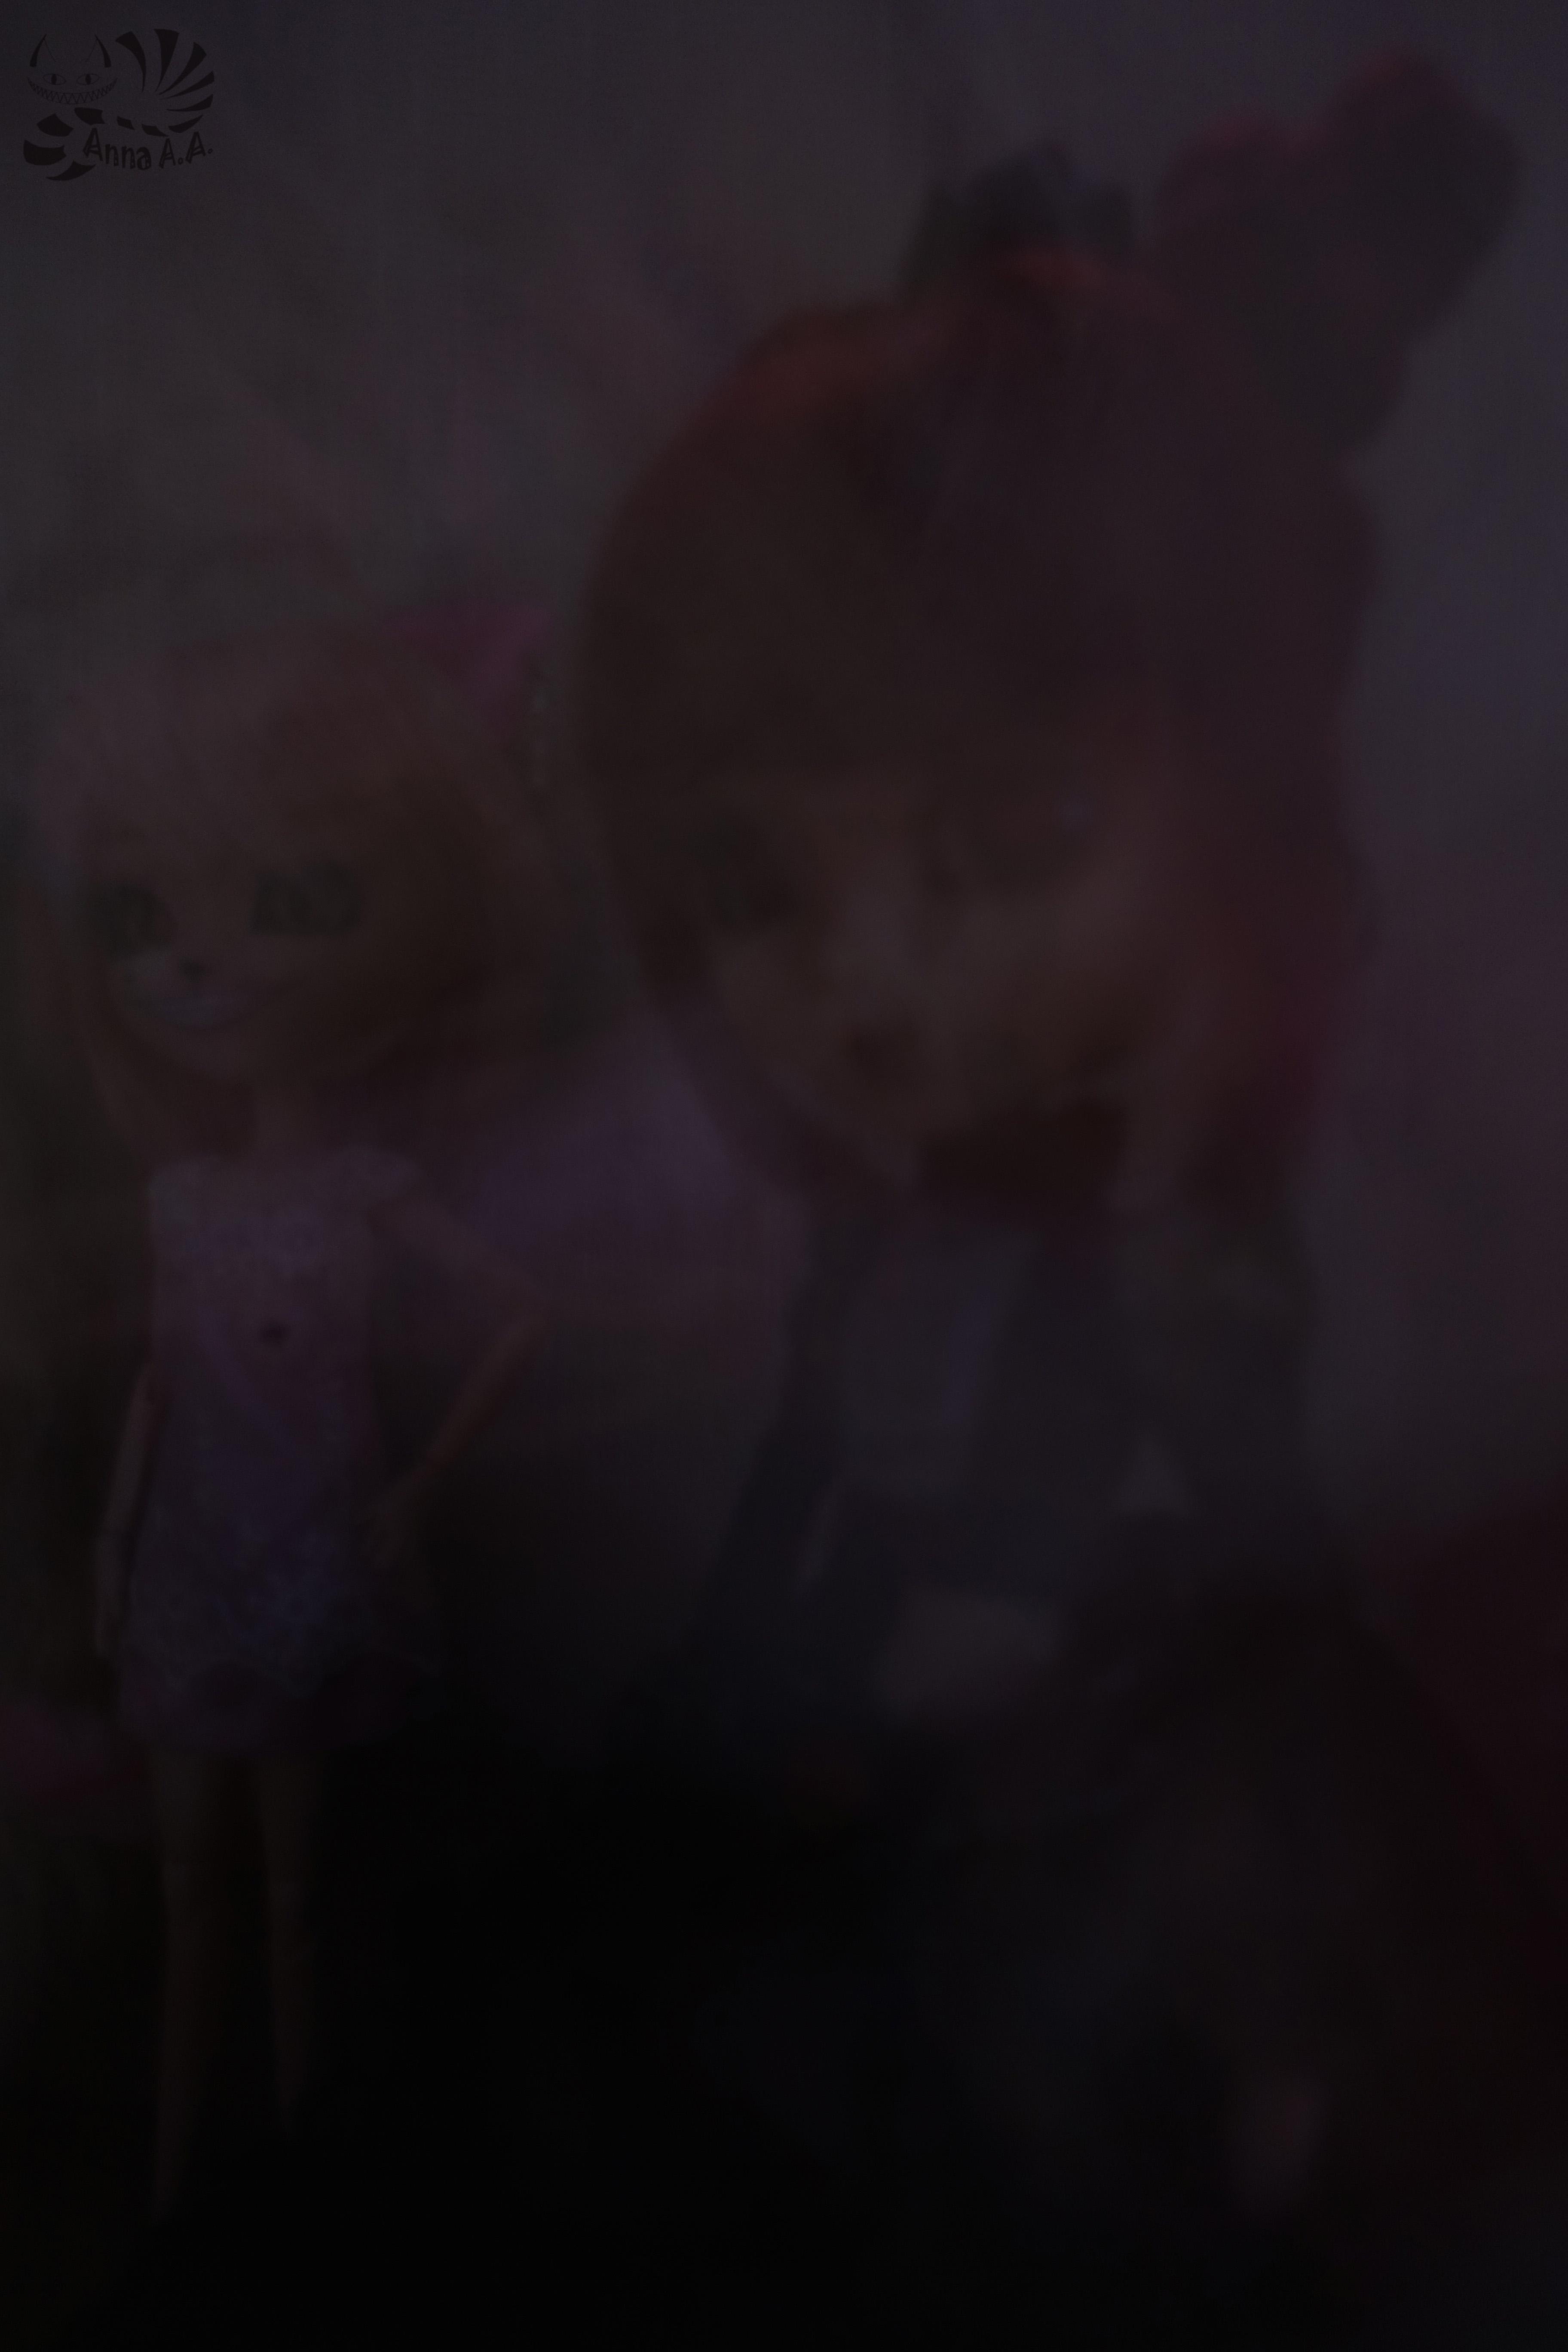 PULLIP Lonely Queen — октябрь 2010 - Страница 5 16603362587_060cc50b11_o